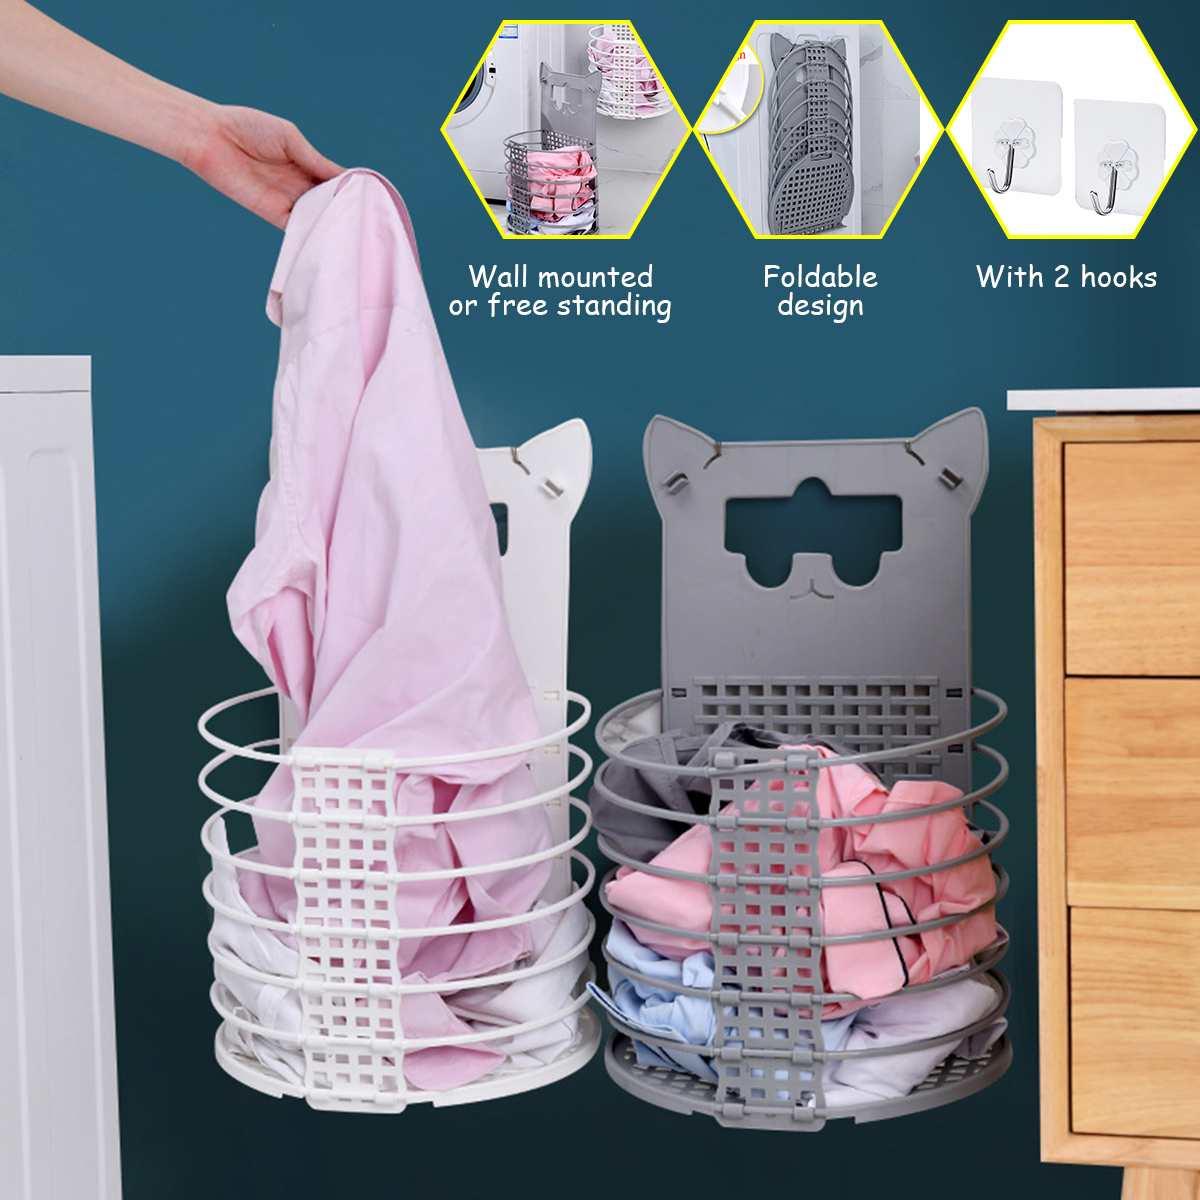 Folding Hamper Bathroom Organizer Clothes Storage Basket Laundry Basket Large Wall-mounted Plastic Storage Rack For Home Storage